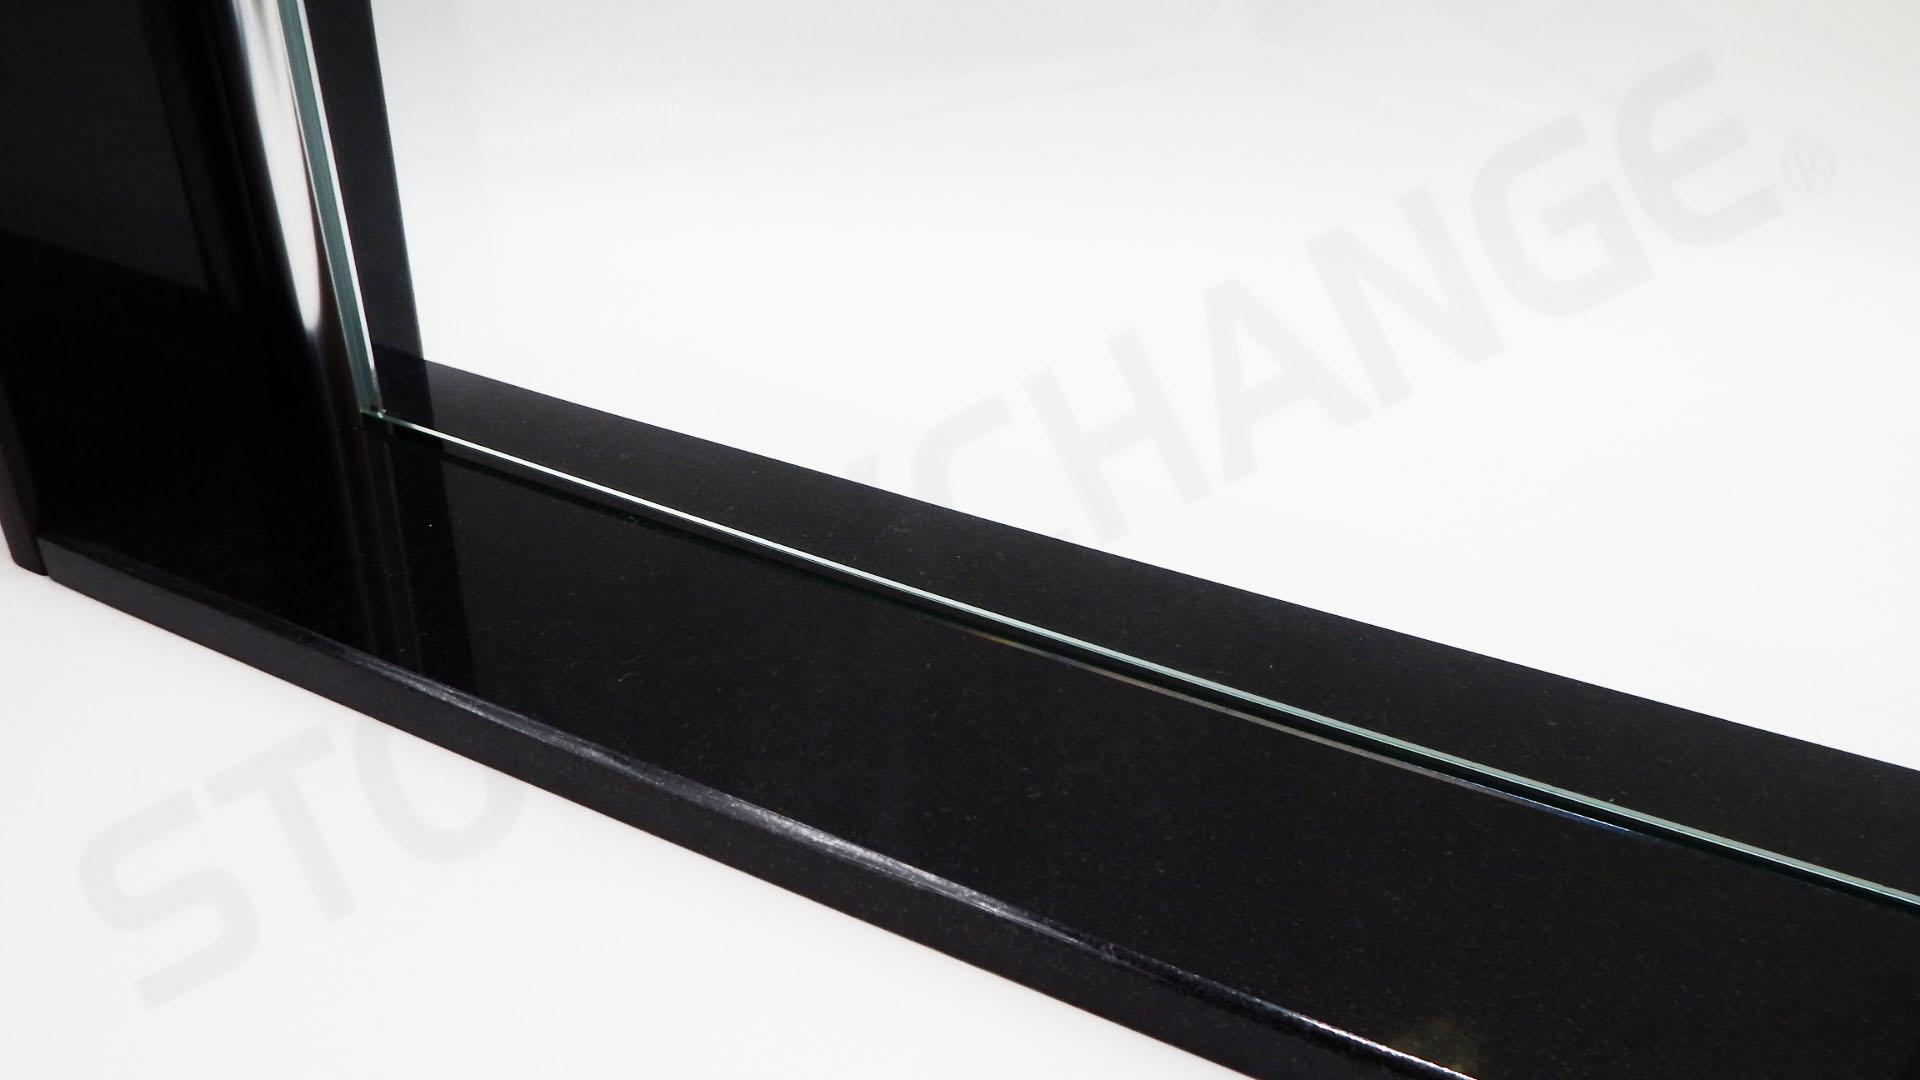 Absolute Black Granite Shower Curb